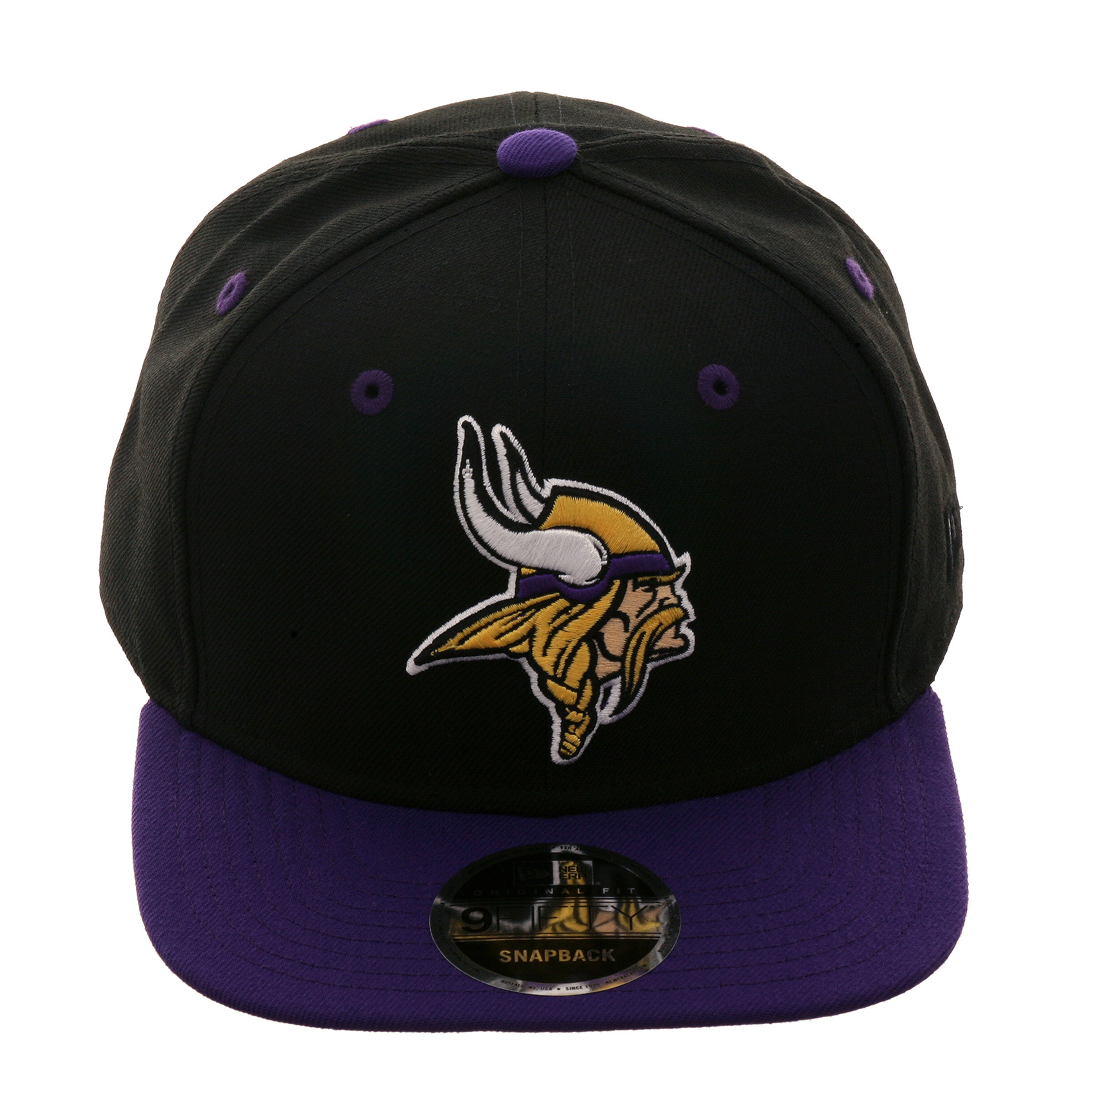 info for 8dce6 4a6ca Exclusive New Era 9Fifty Minnesota Vikings Snapback Hat - 2T Black, Purple,   29.99